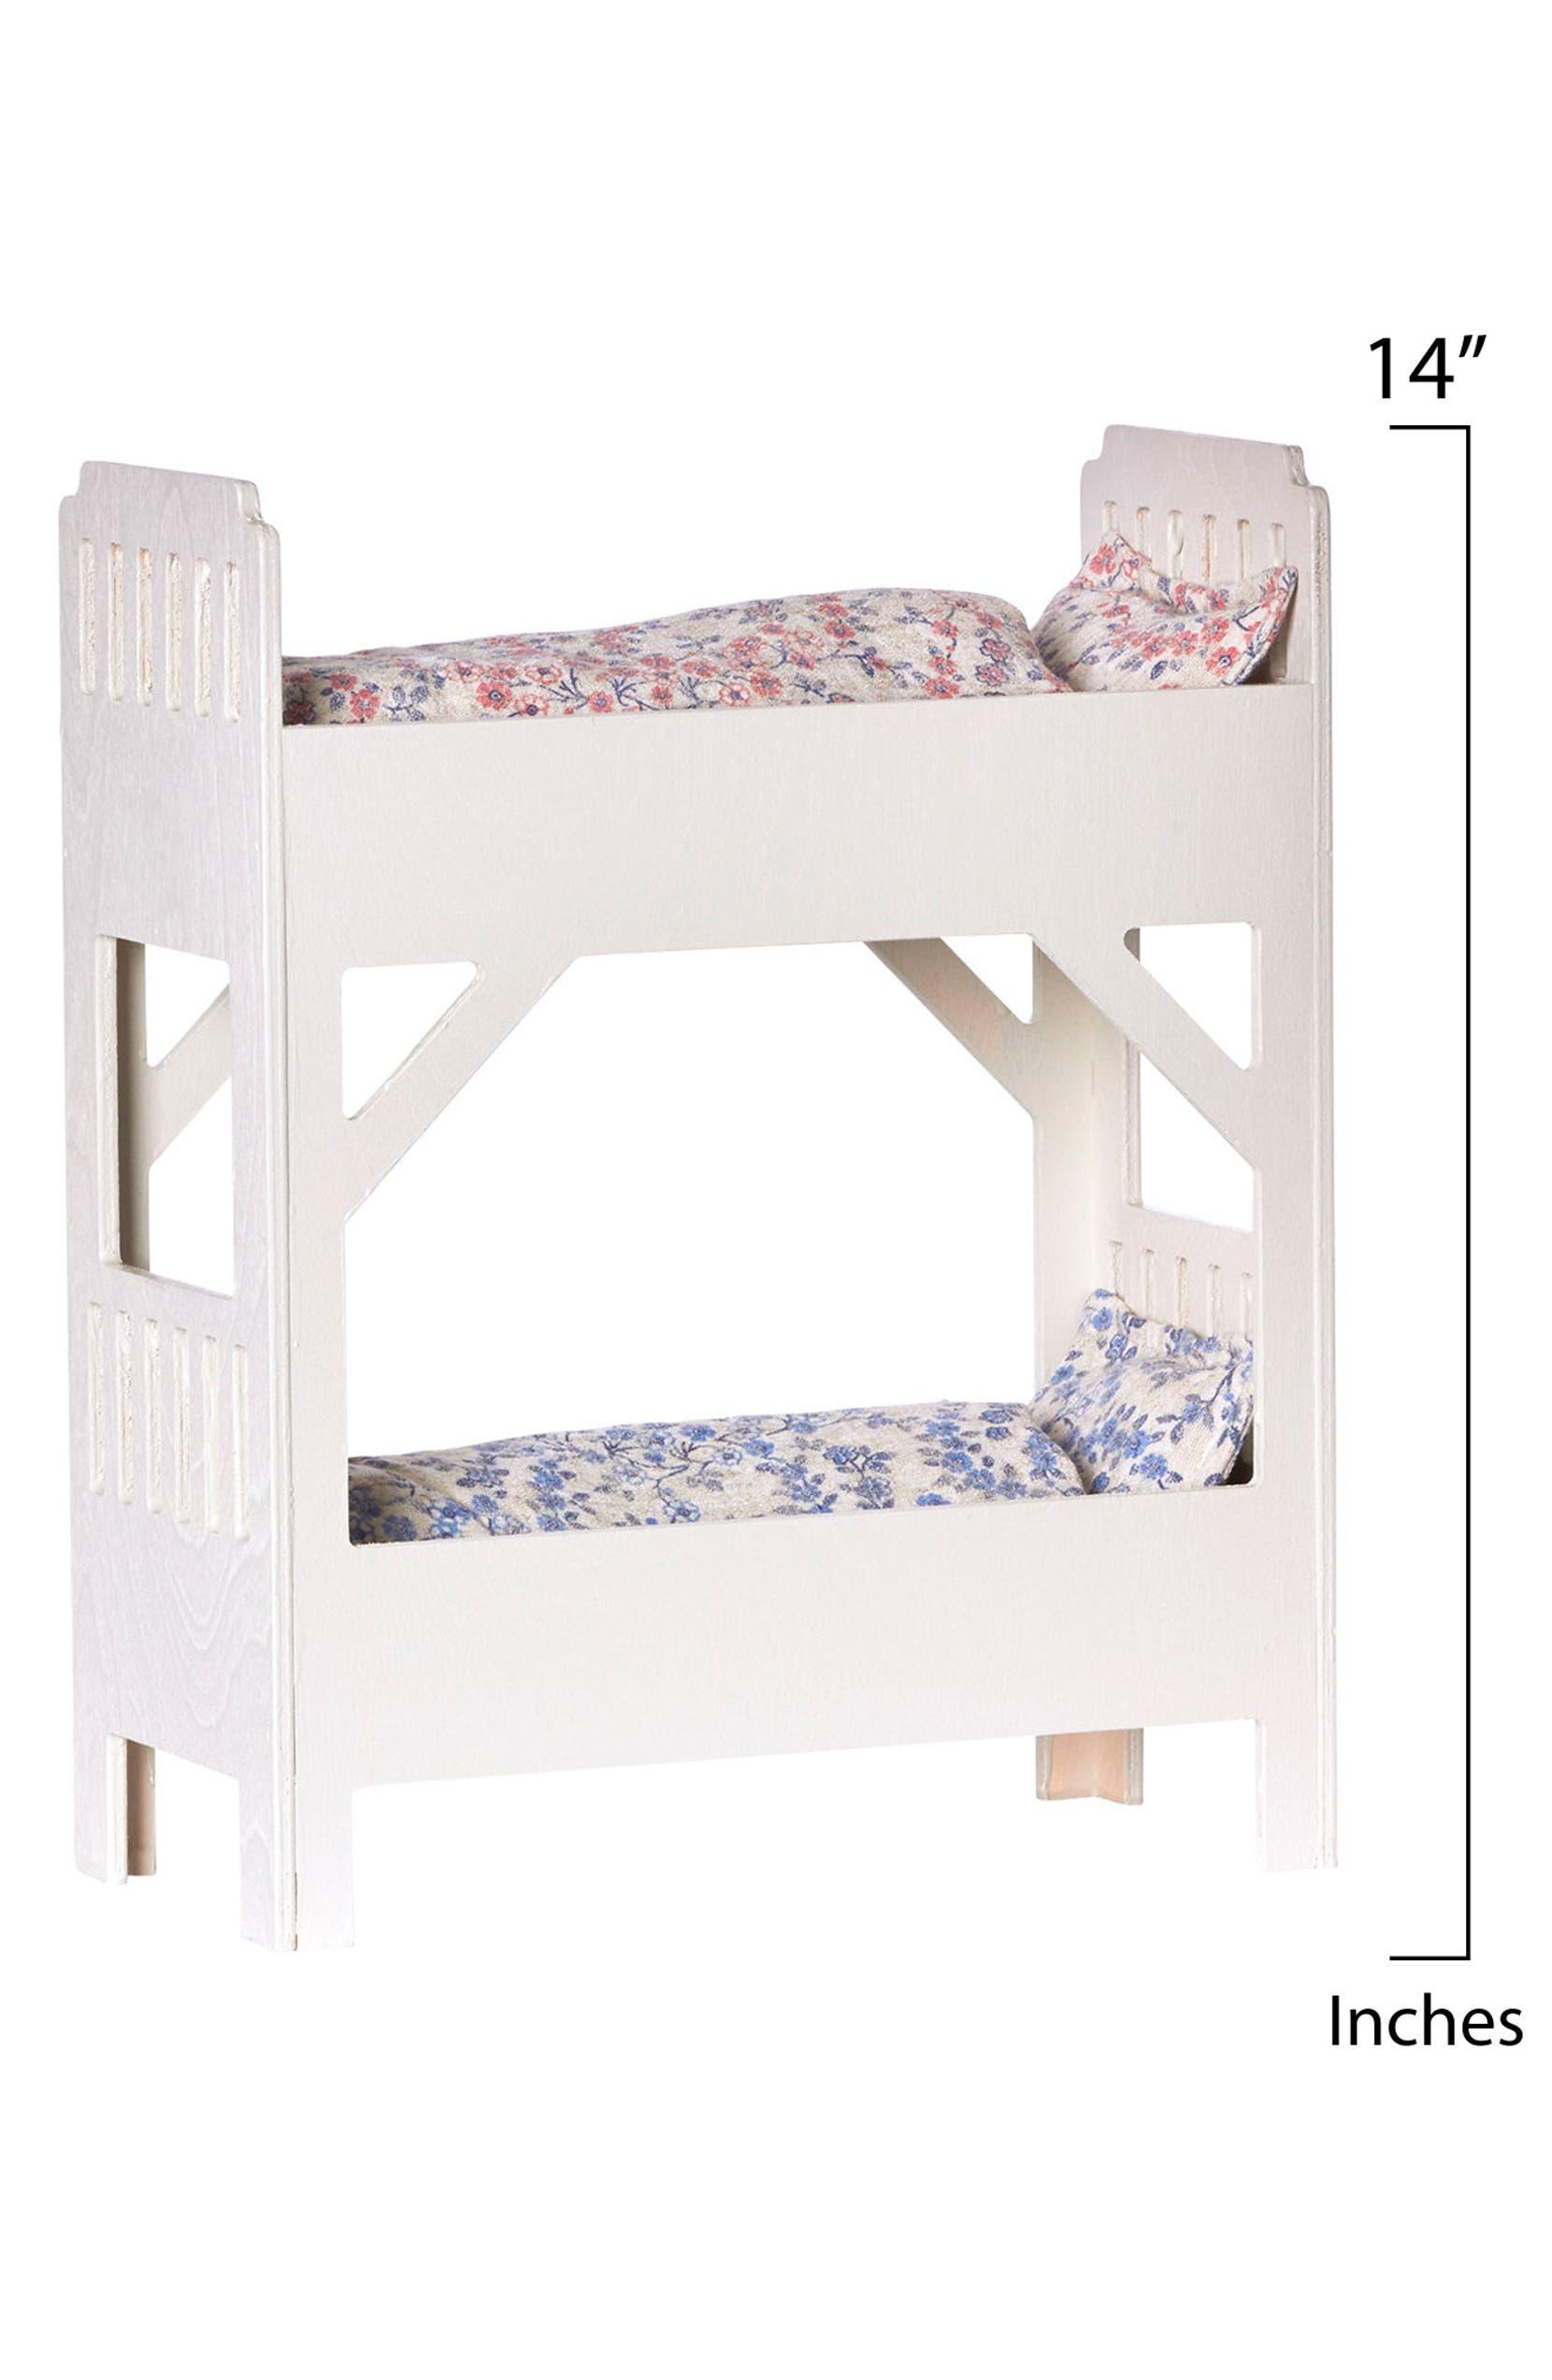 Prime Maileg Small Wooden Doll Bunk Bed Nordstrom Inzonedesignstudio Interior Chair Design Inzonedesignstudiocom